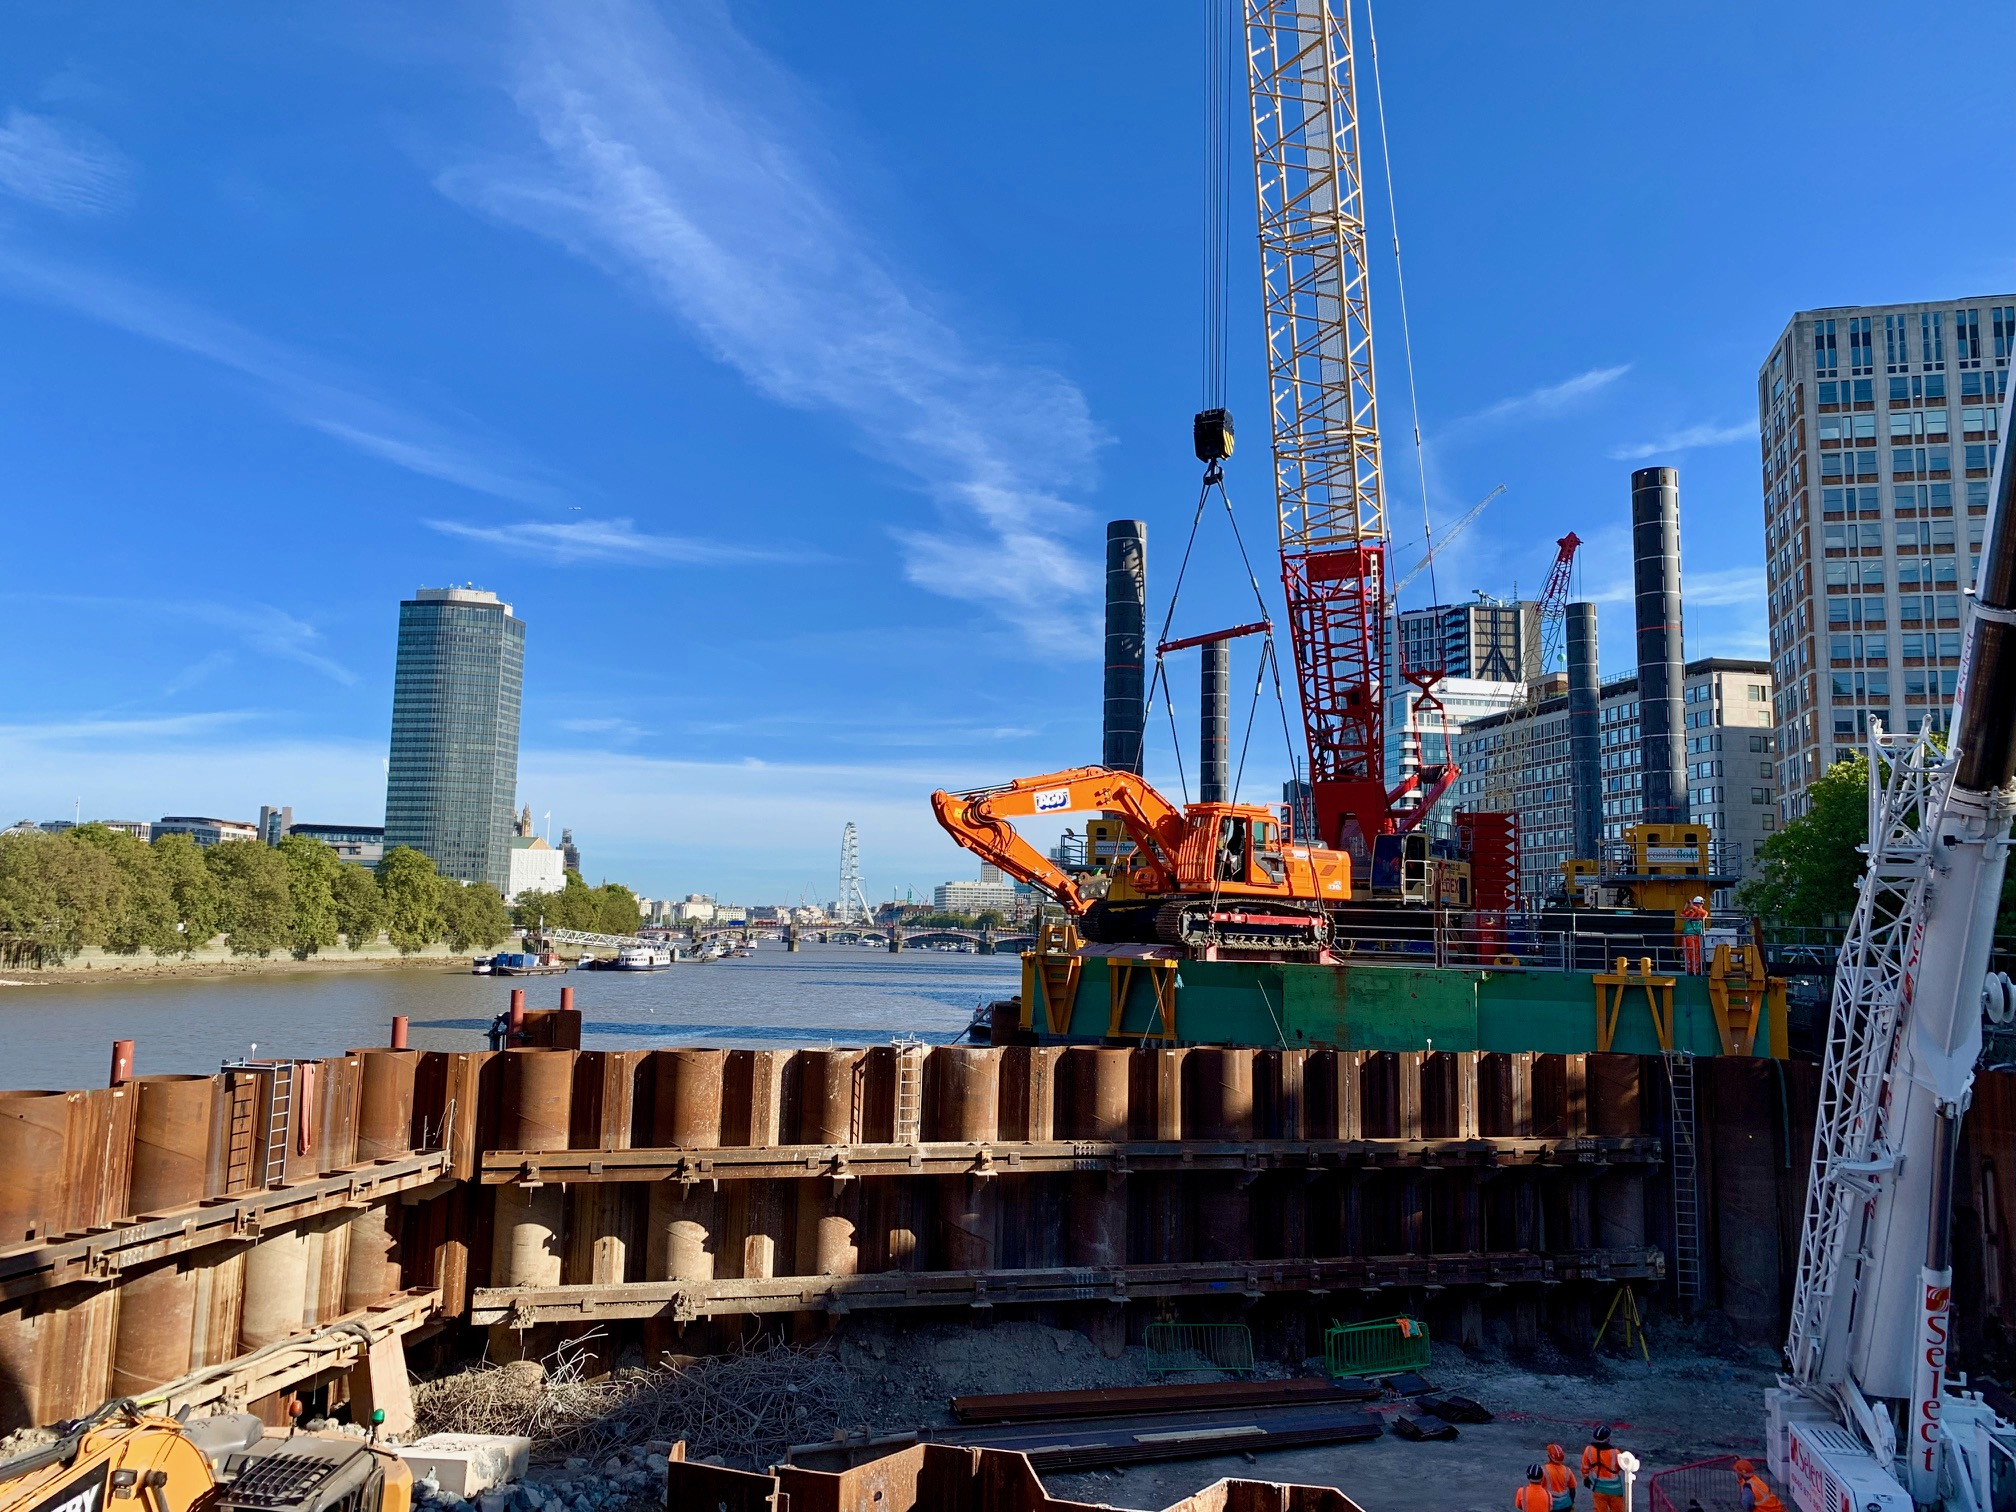 Sheet piling rig flown into cofferdam in London